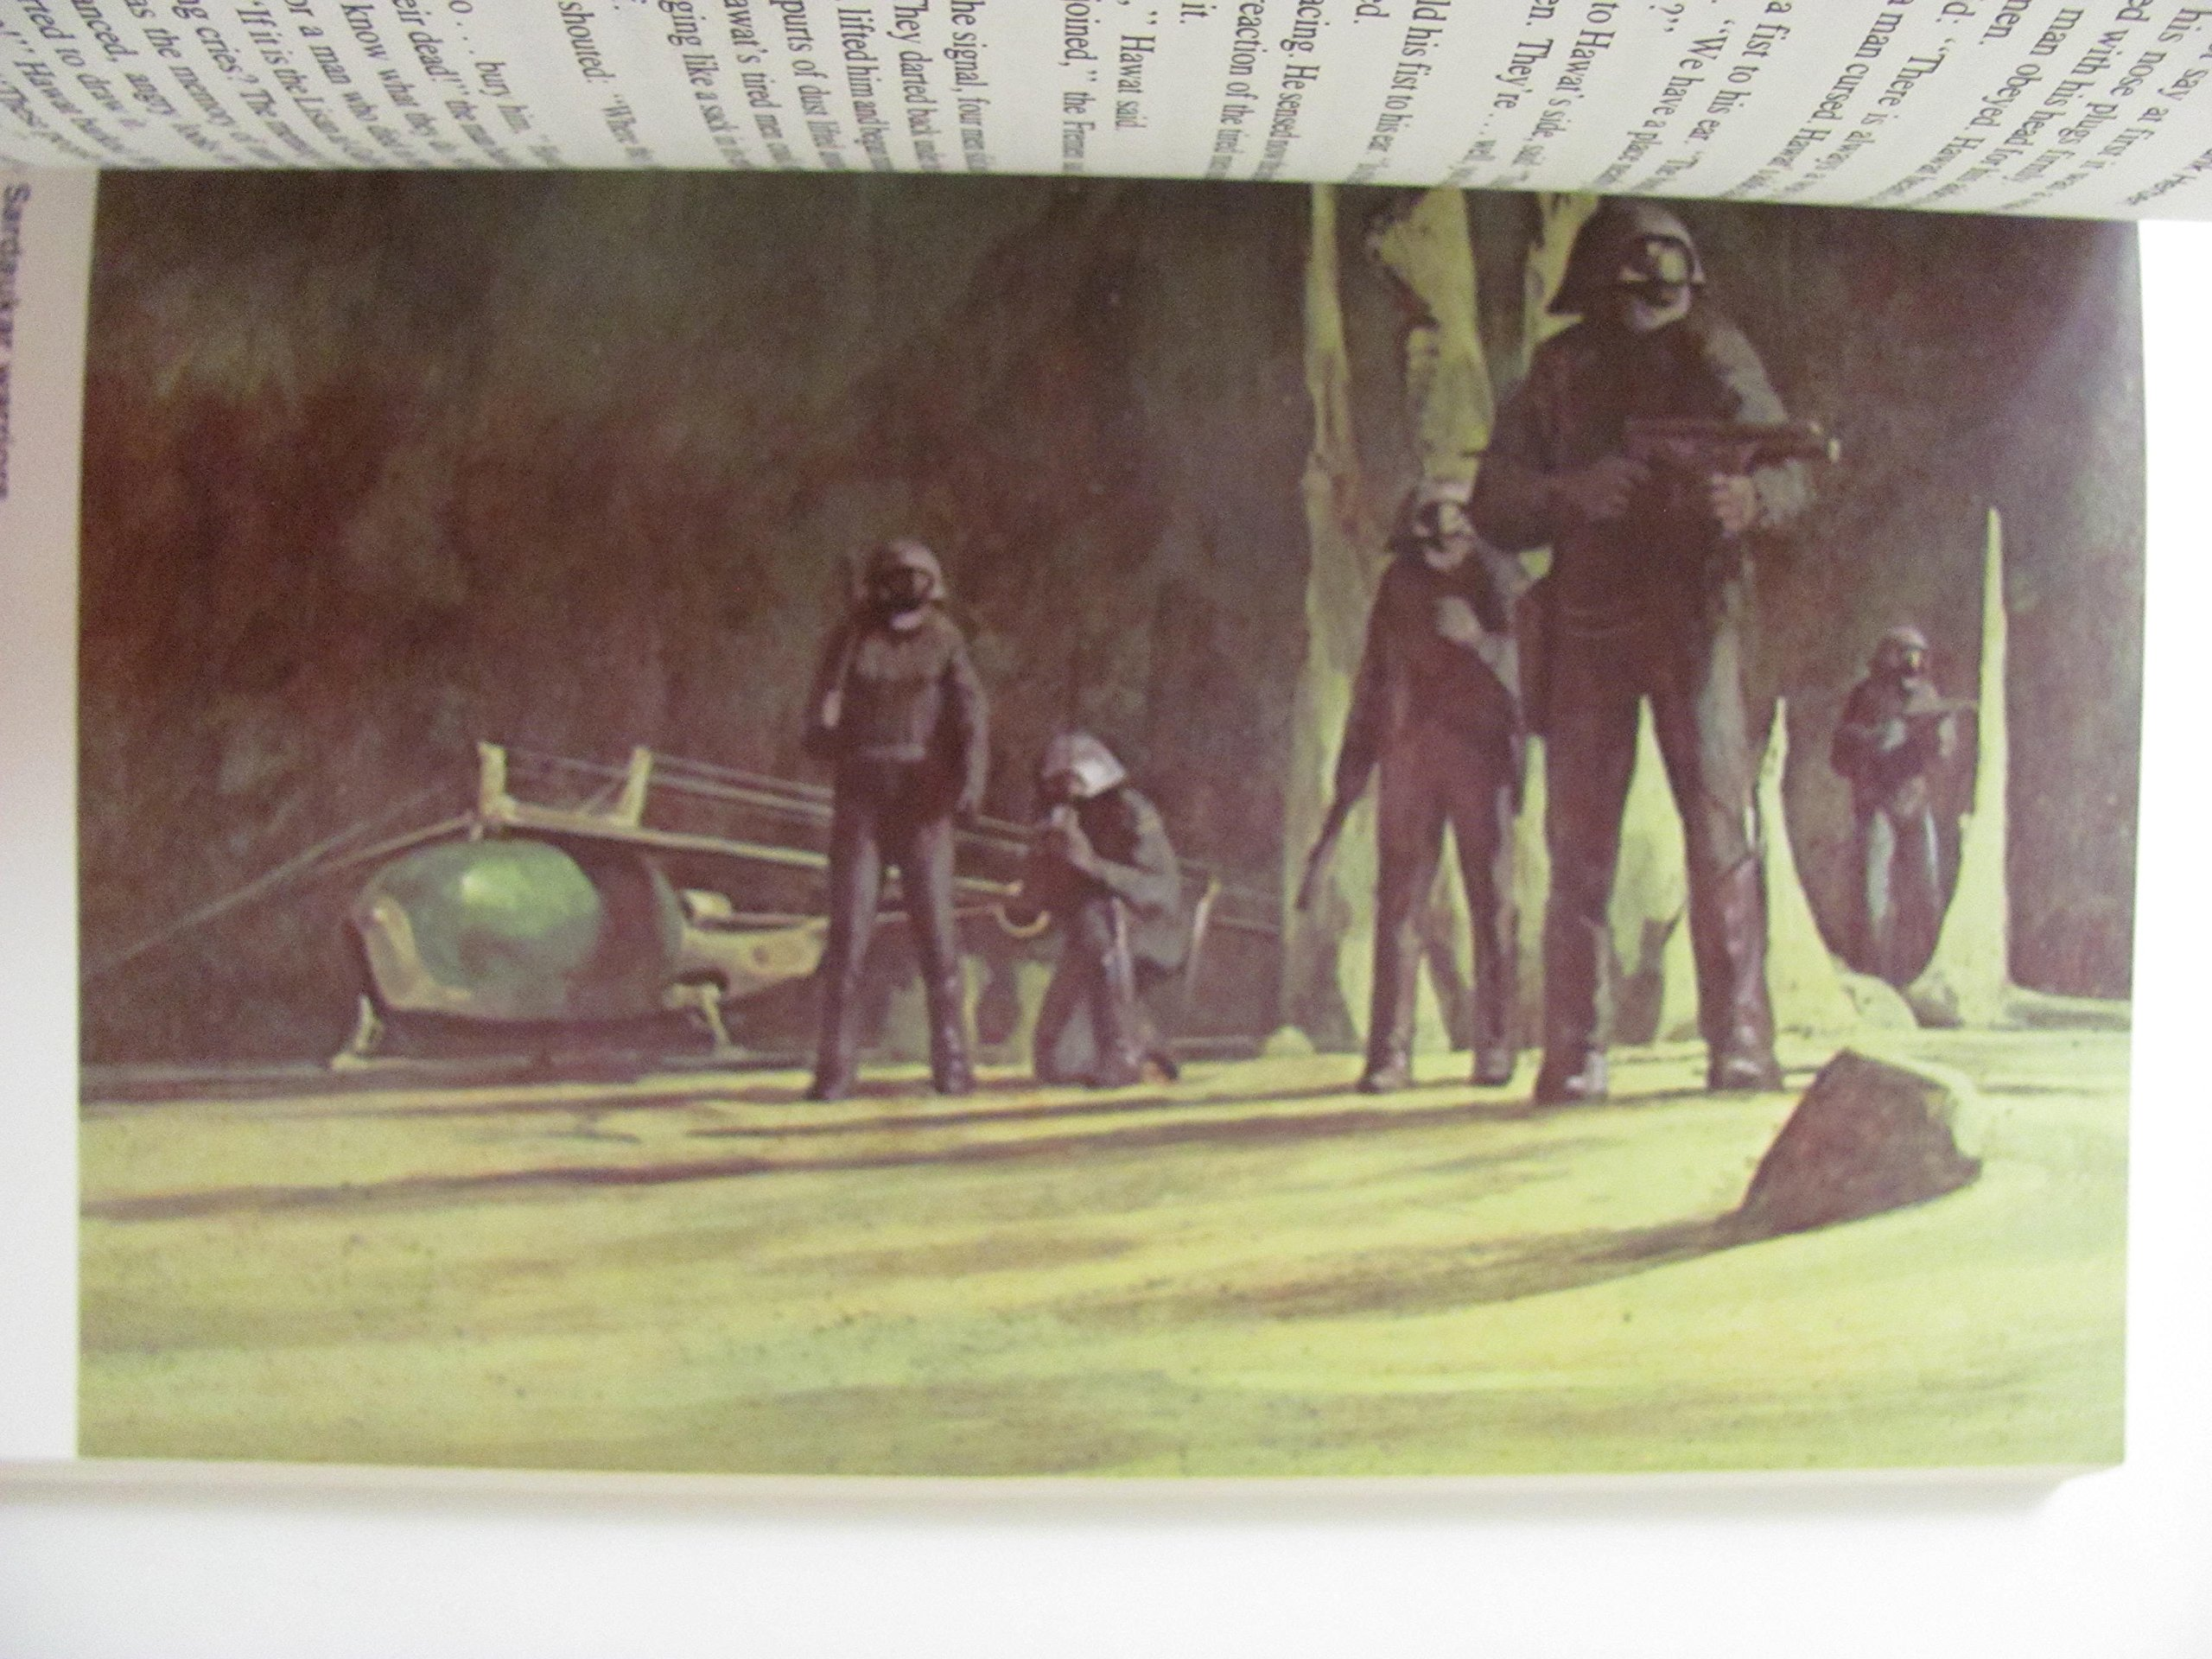 Illustrated Dune: Amazon.es: Frank Herbert: Libros en idiomas extranjeros